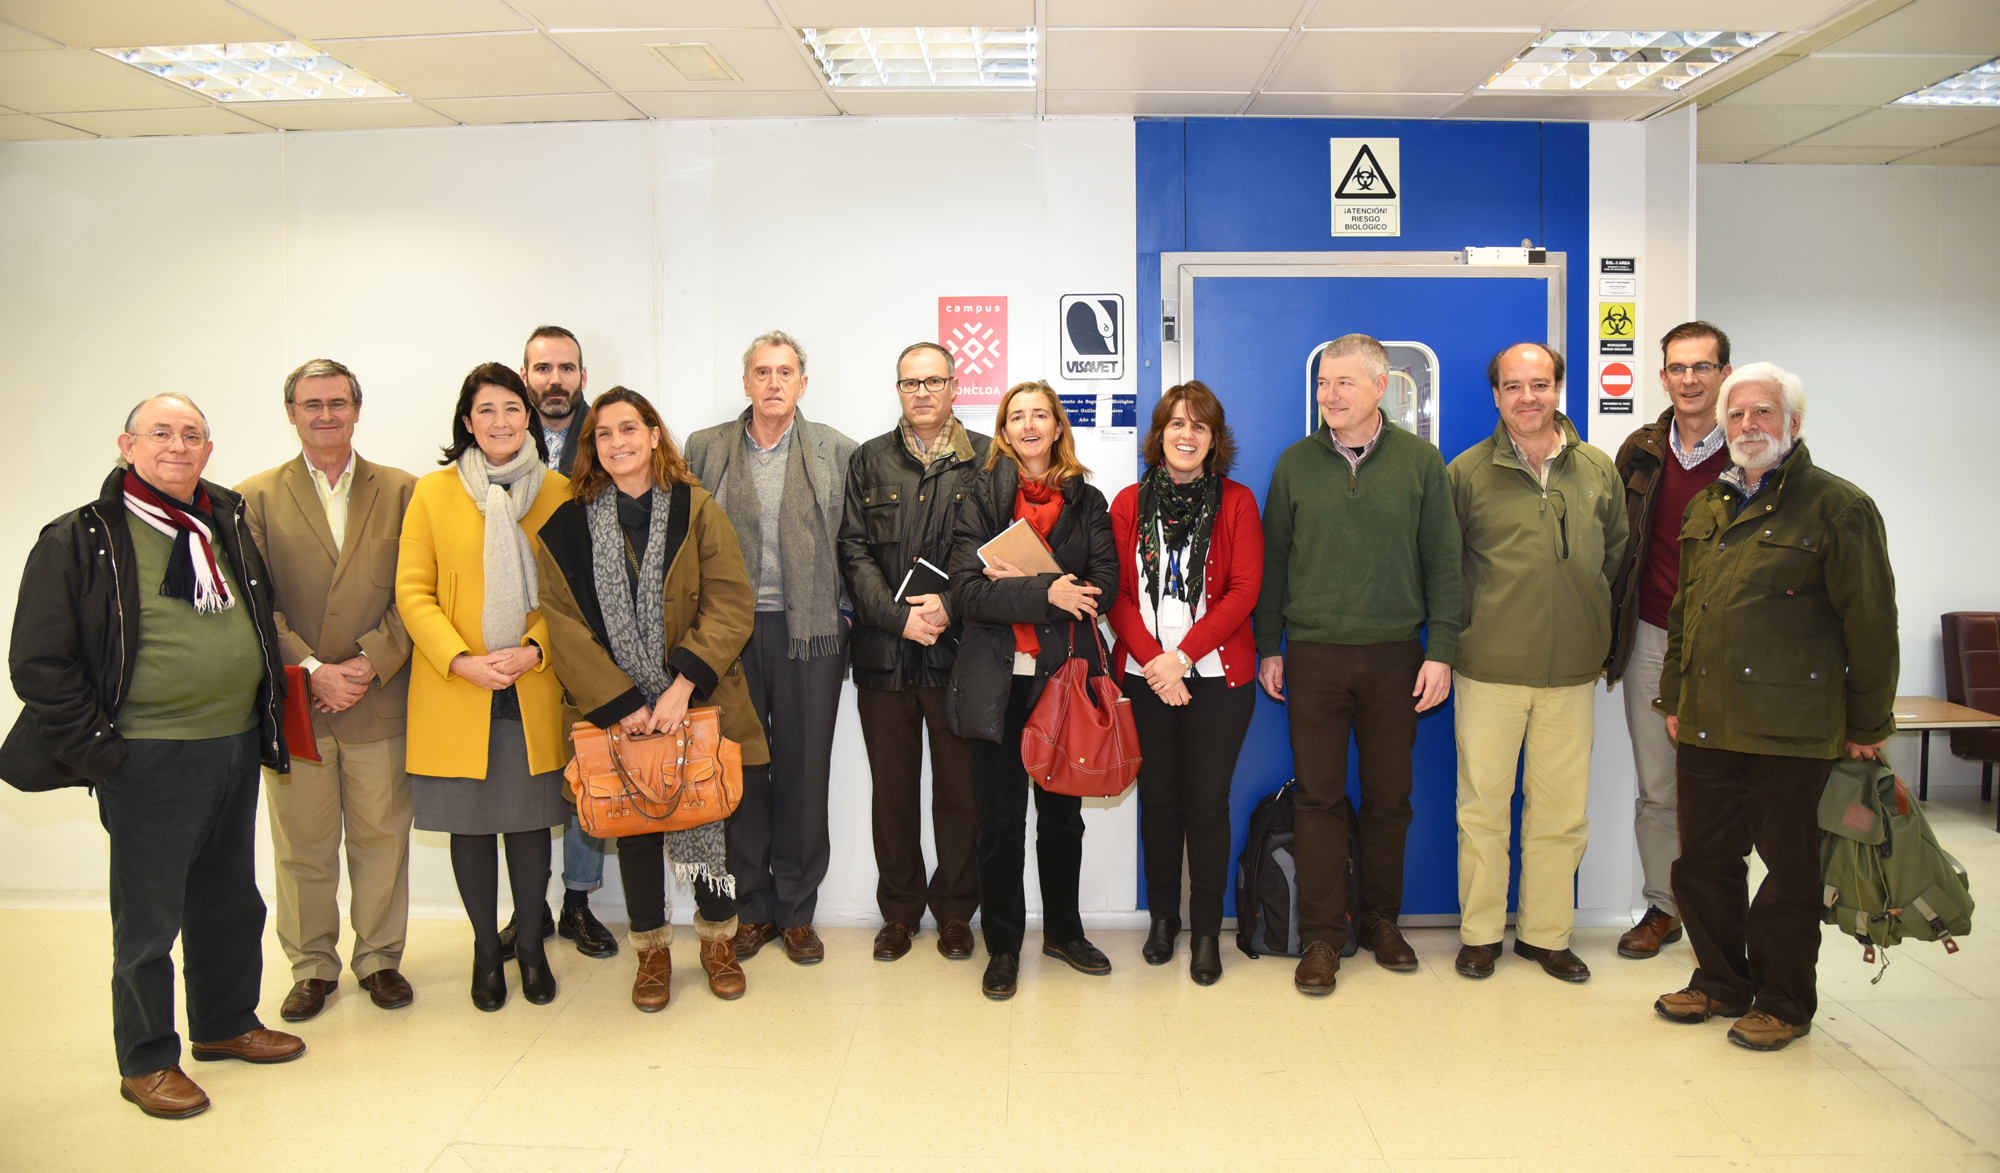 investigadores-representantes-dehesa-caza-tuberculosis